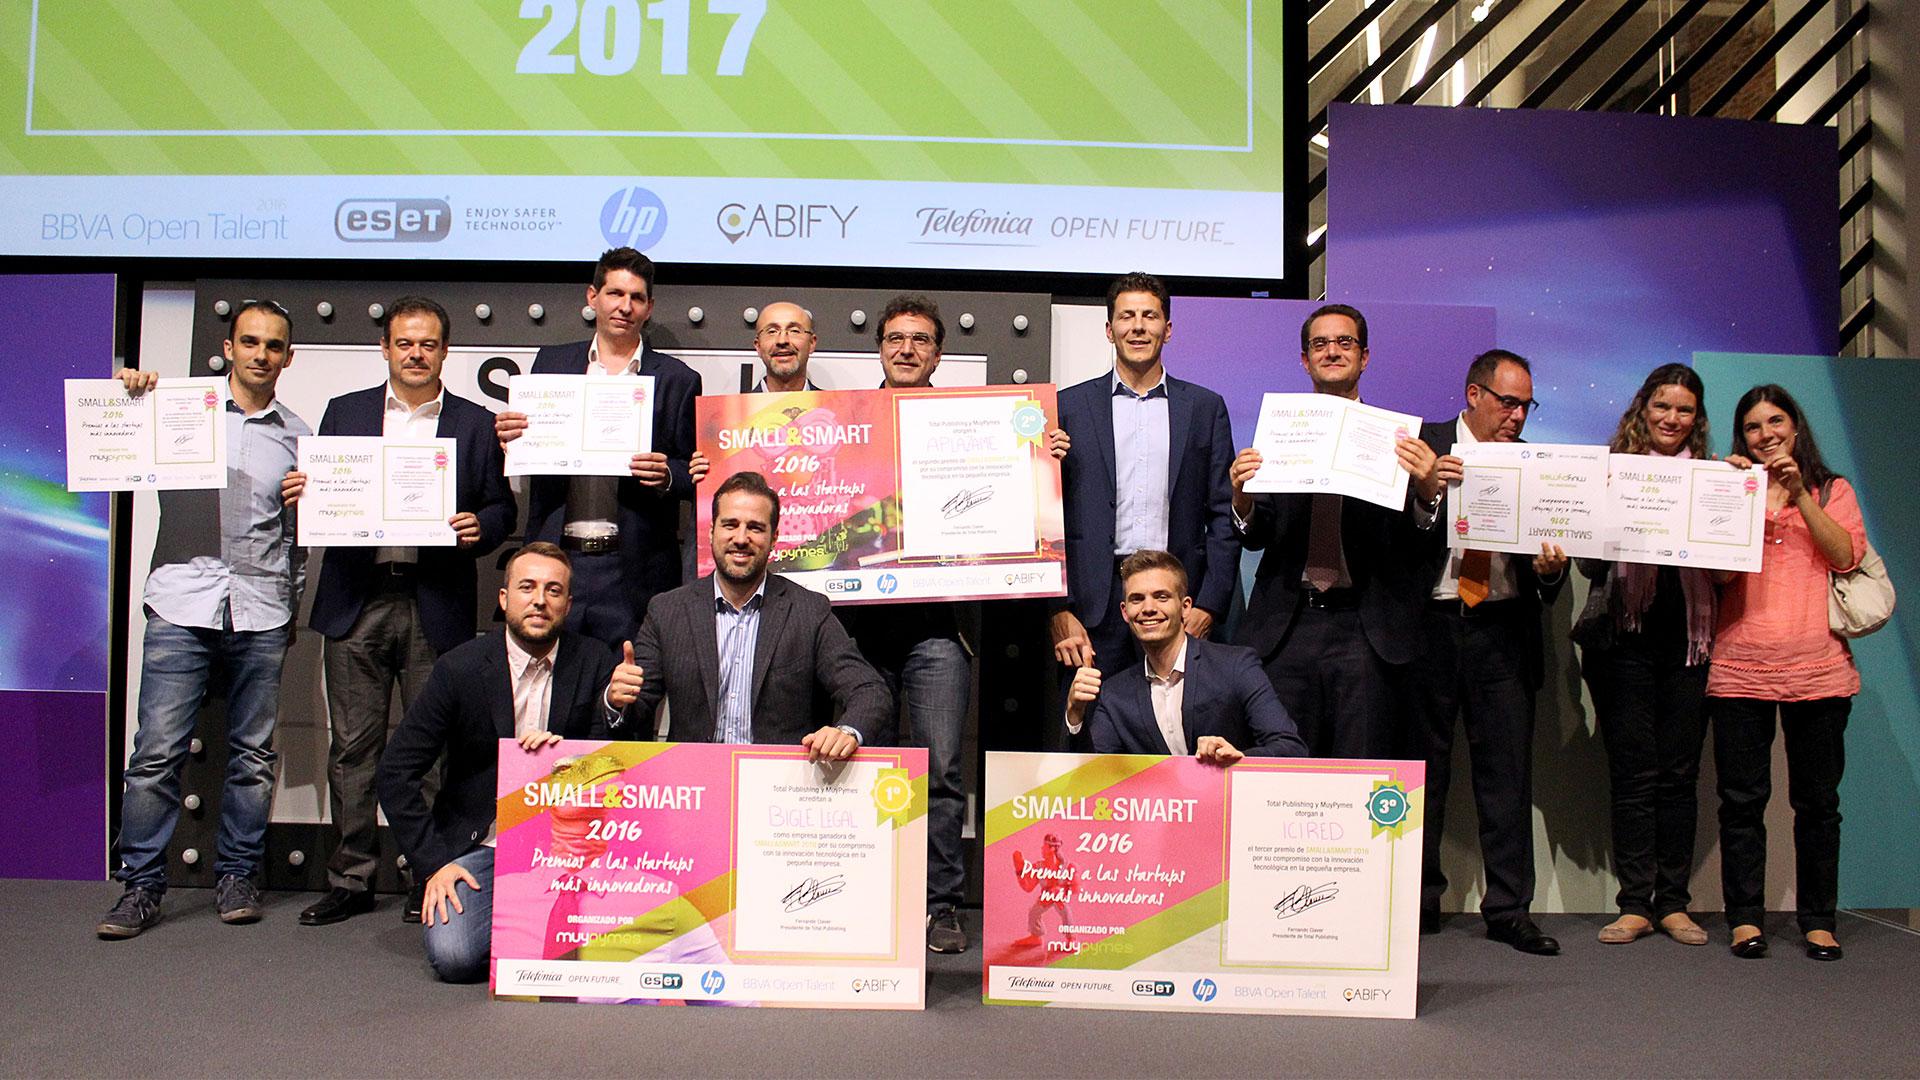 tpnet-small-smart-2016-evento-startups-ganadores-finalistas